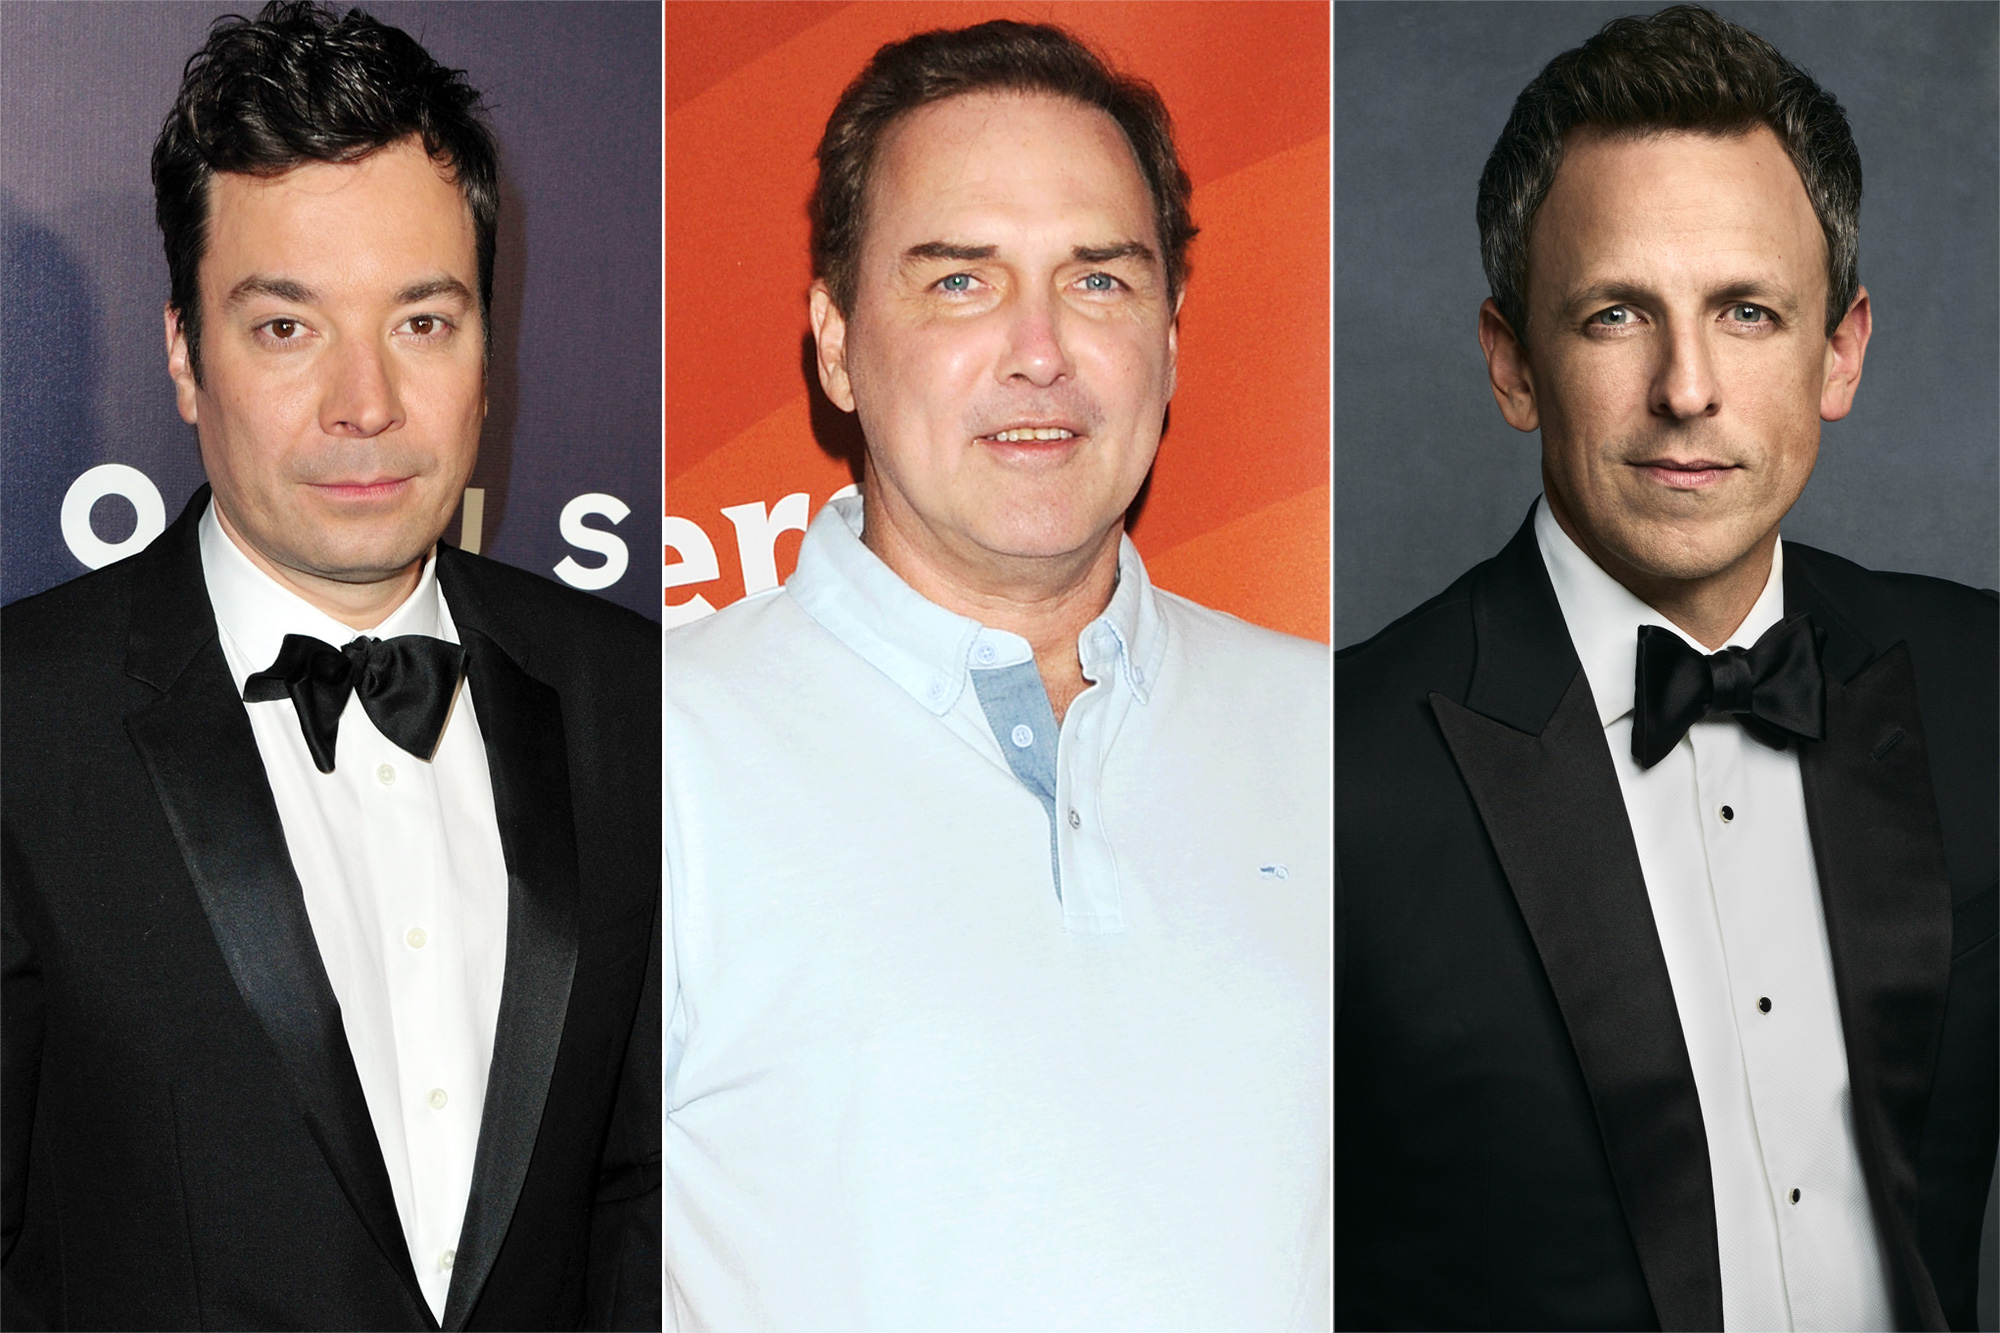 Jimmy Fallon, Norm MacDonald, Seth Meyers